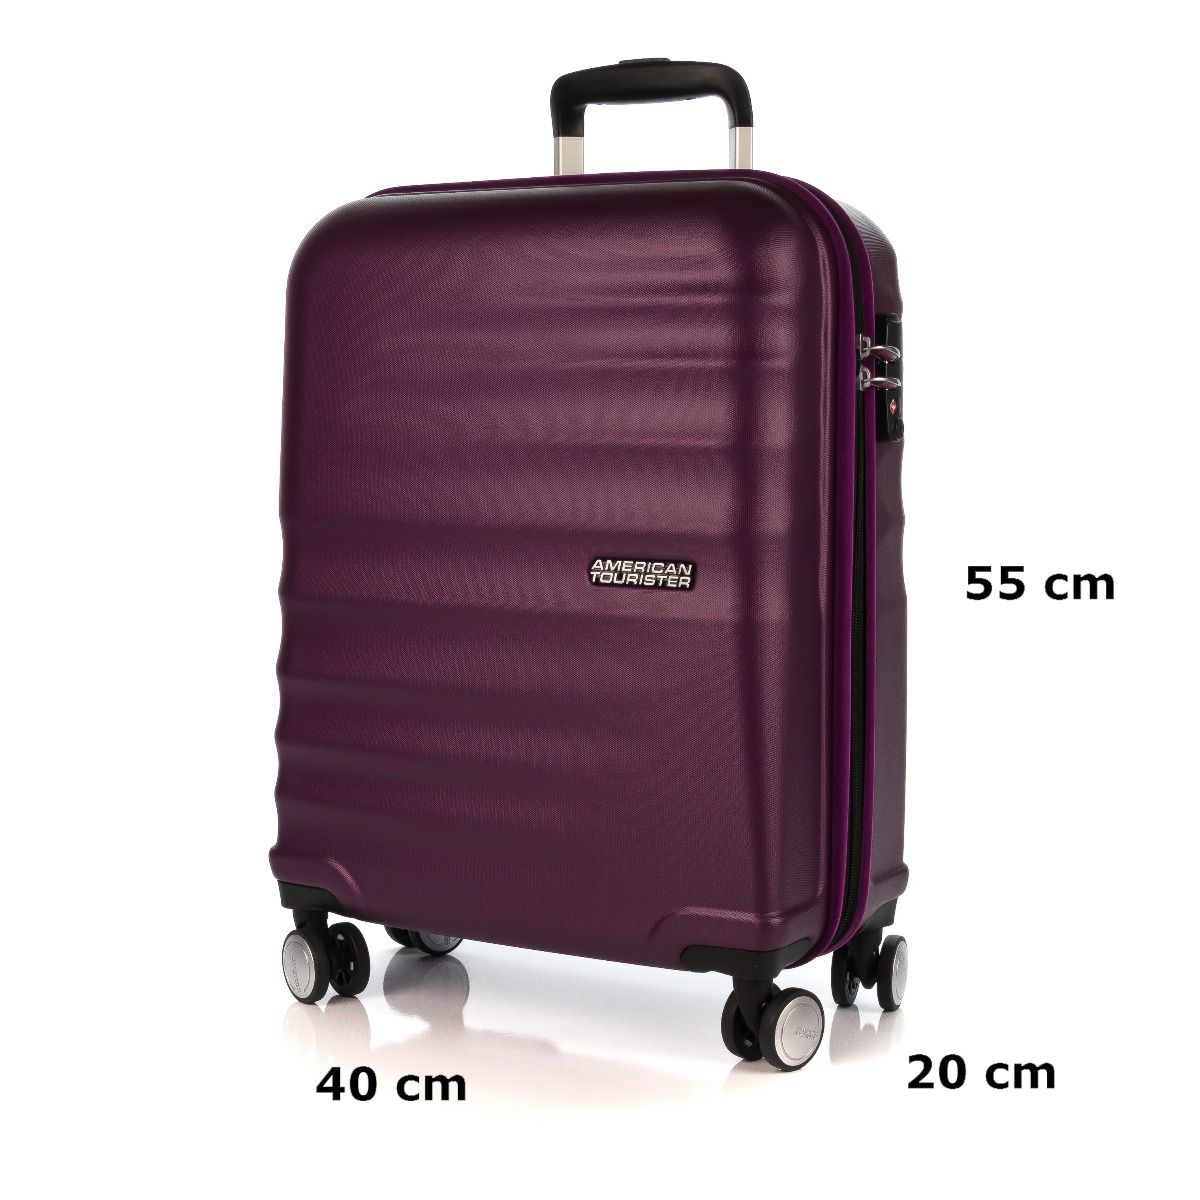 d200cc34ae8394 AMERICAN TOURISTER WAVEBREAKER 15G008-50|bagaglio a mano viola|Shoe  Center|Shop online